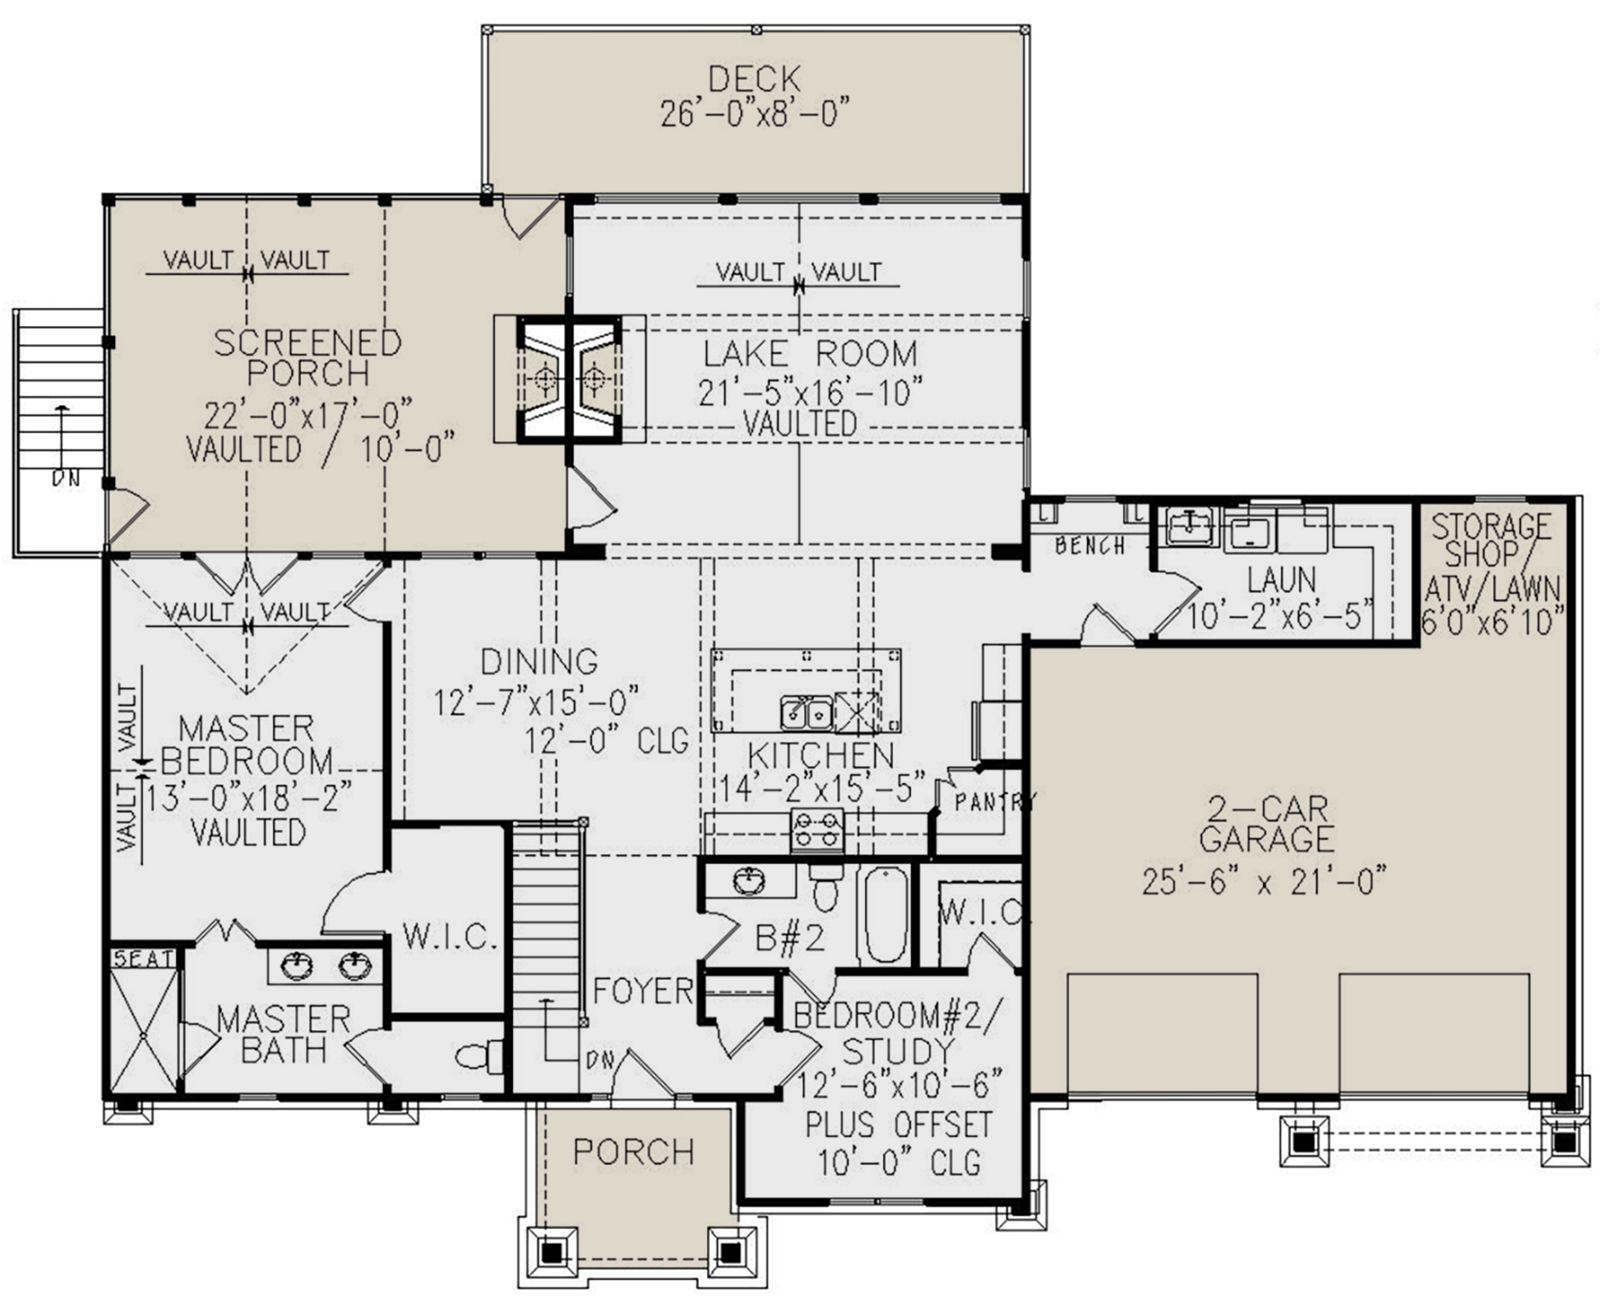 House Plan 699 00158 Mountain Plan 2 510 Square Feet 4 Bedrooms 3 Bathrooms Basement House Plans Cabin Floor Plans Building Plans House